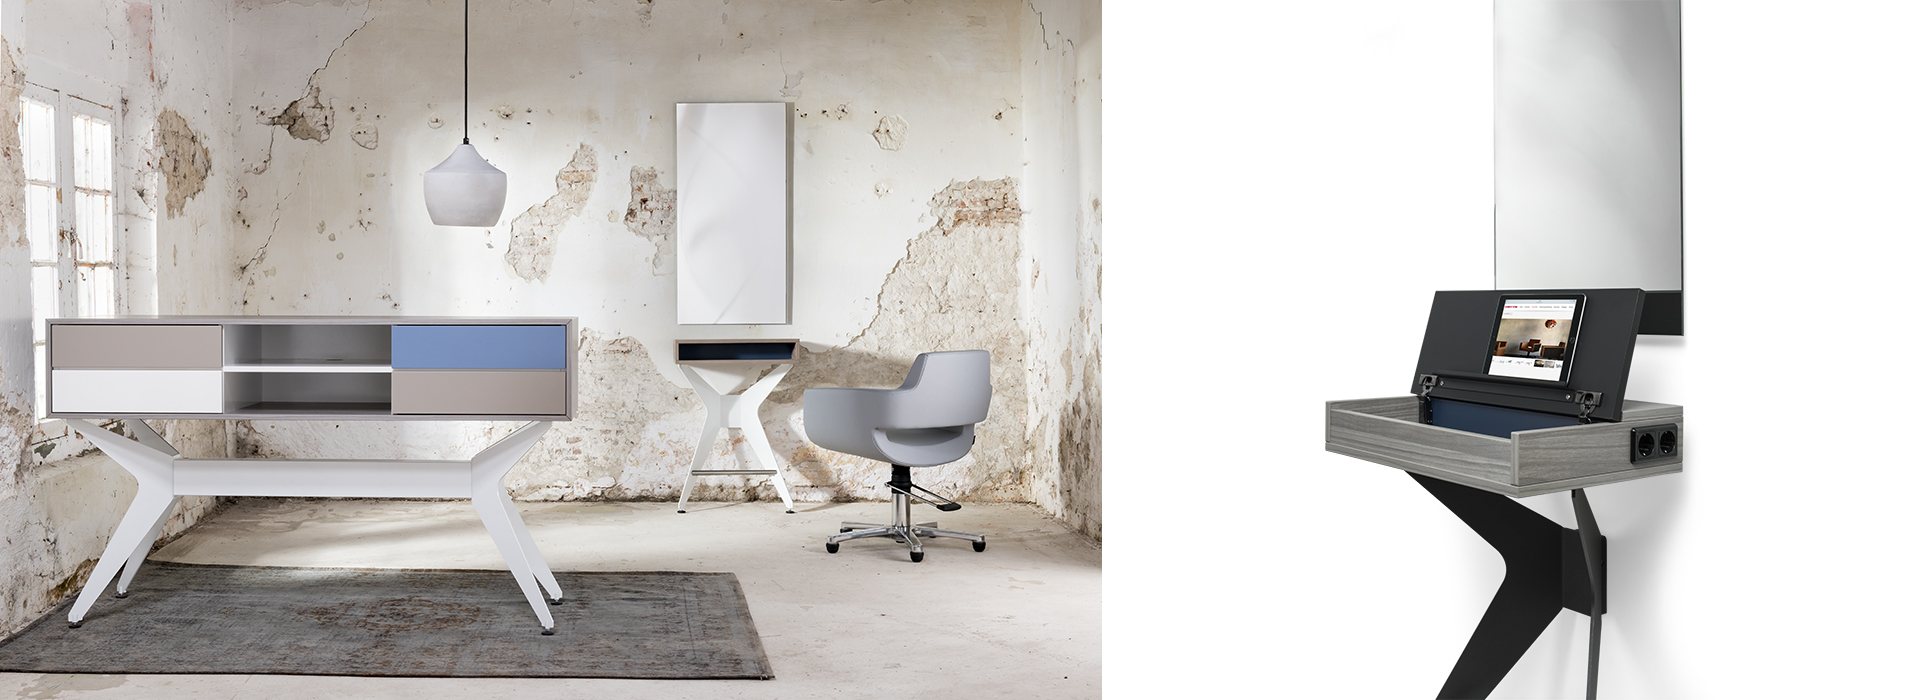 Welonda Norway frisørmøbler